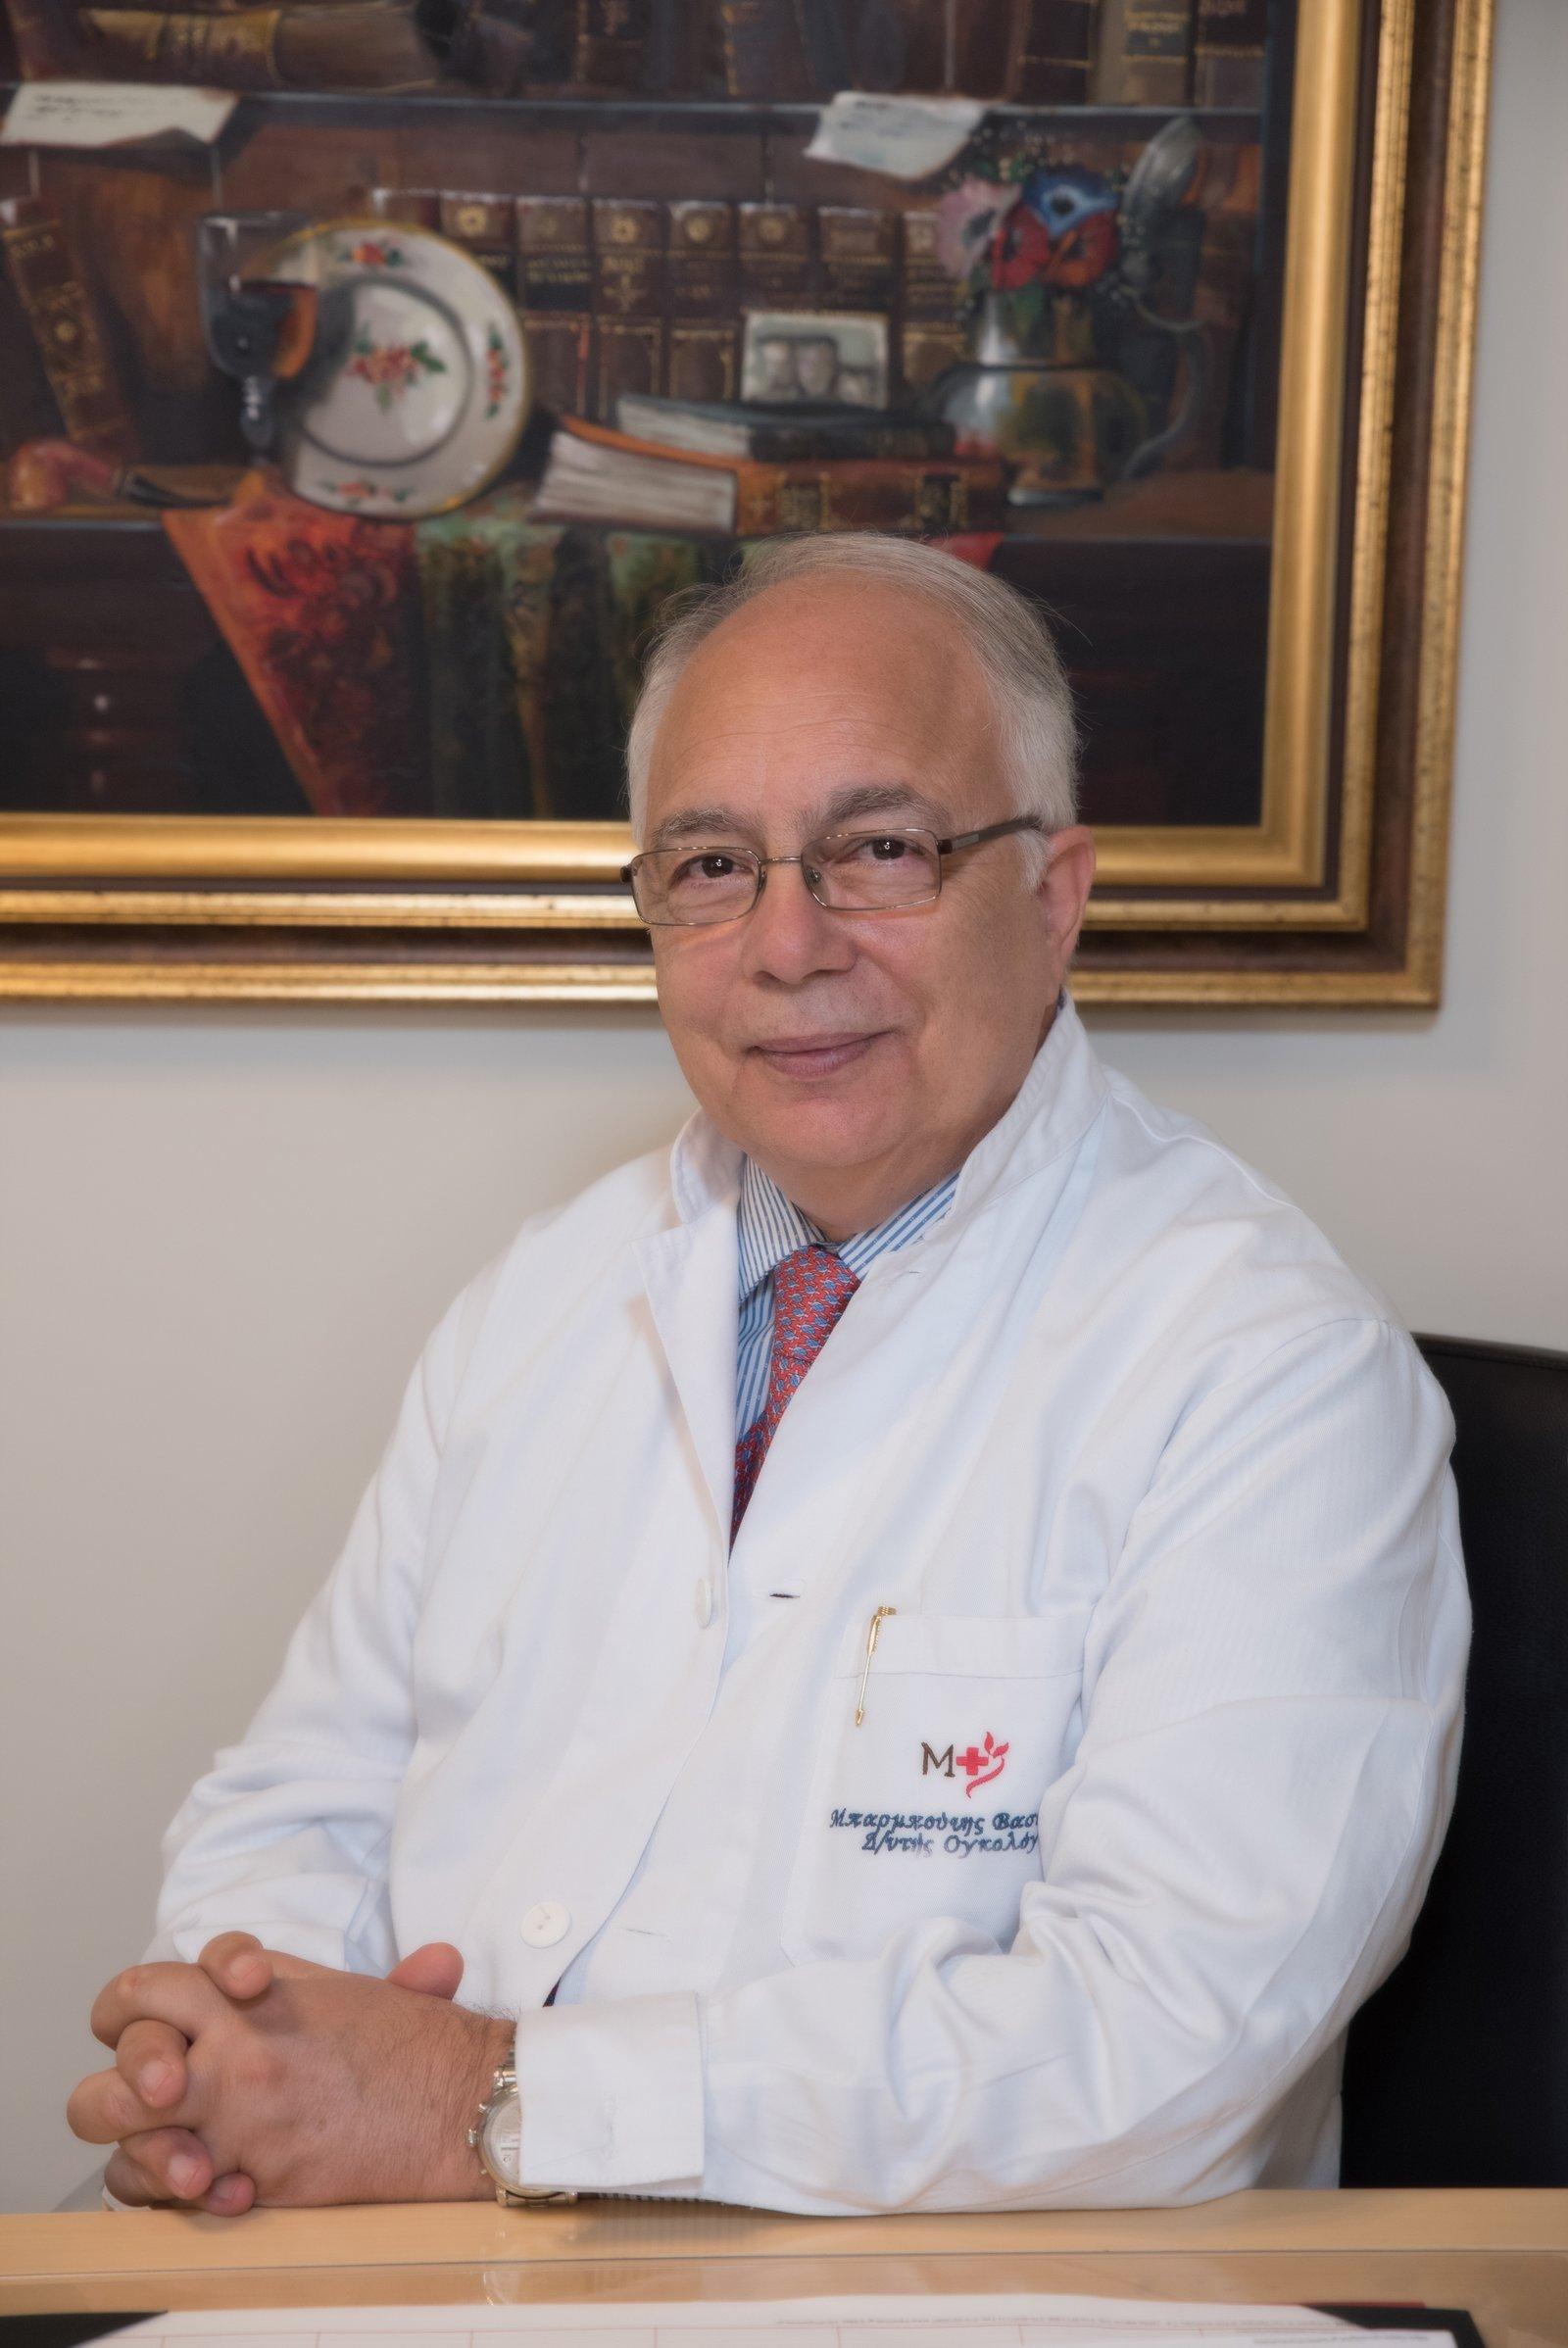 mRNA εμβόλια. Μια επιτυχημένη πορεία - Βασίλειος Π. Μπαρμπούνης MD,PhD Παθολόγος Ογκολόγος